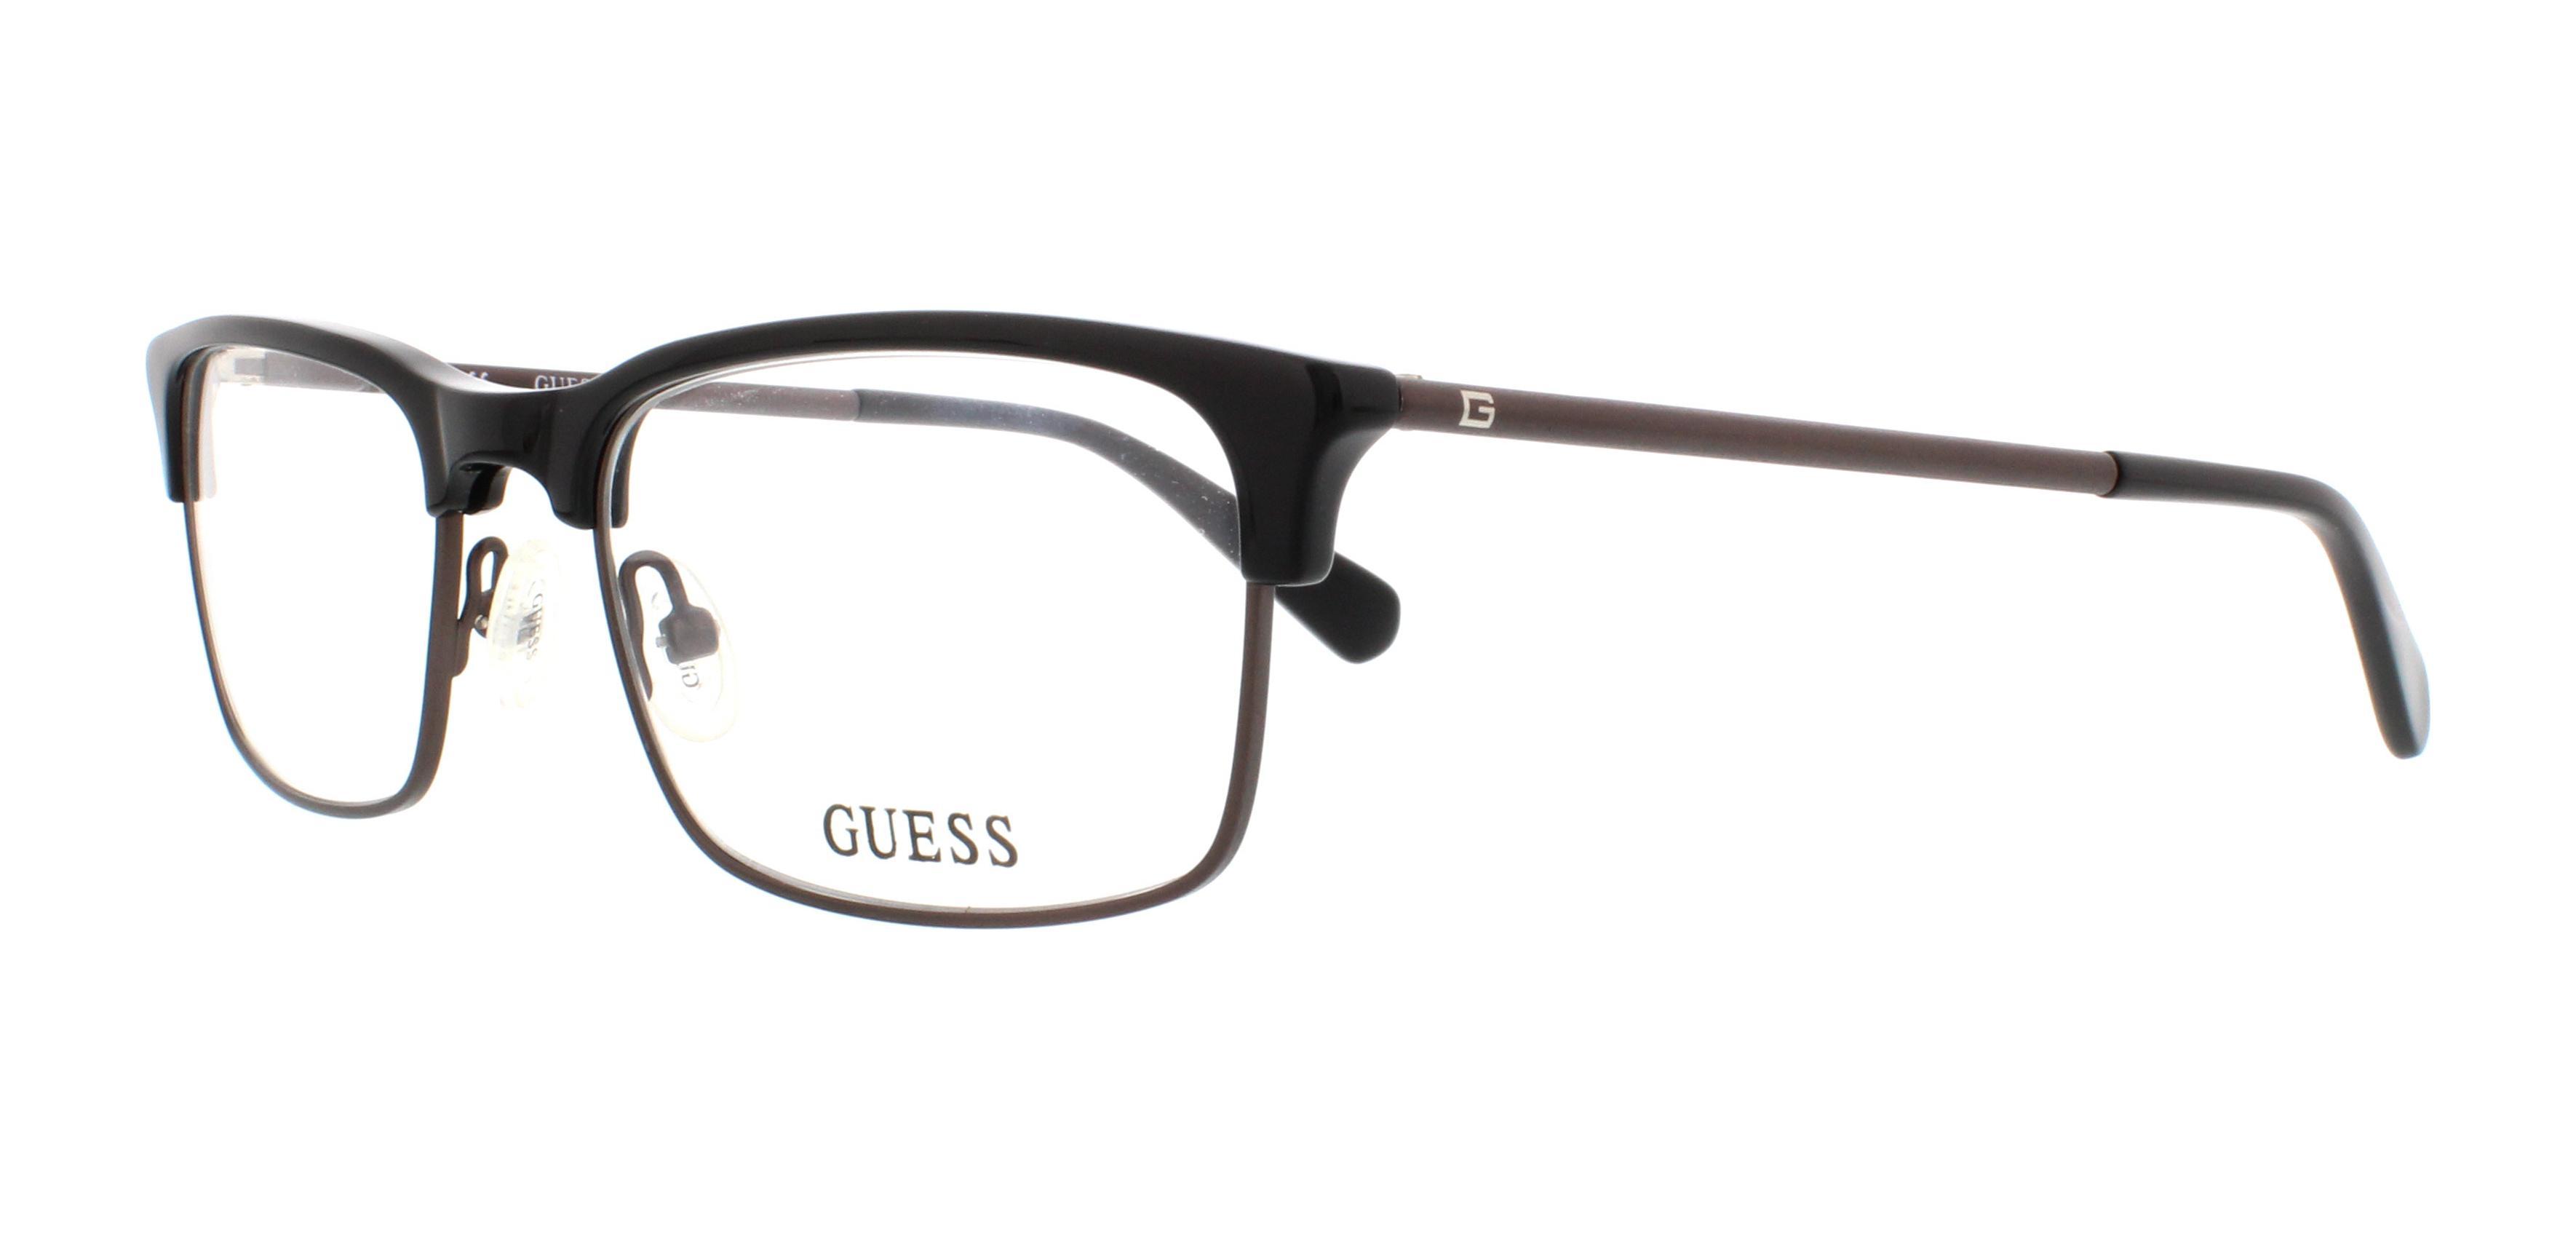 c71778878f Guess Glasses and Sunglasses